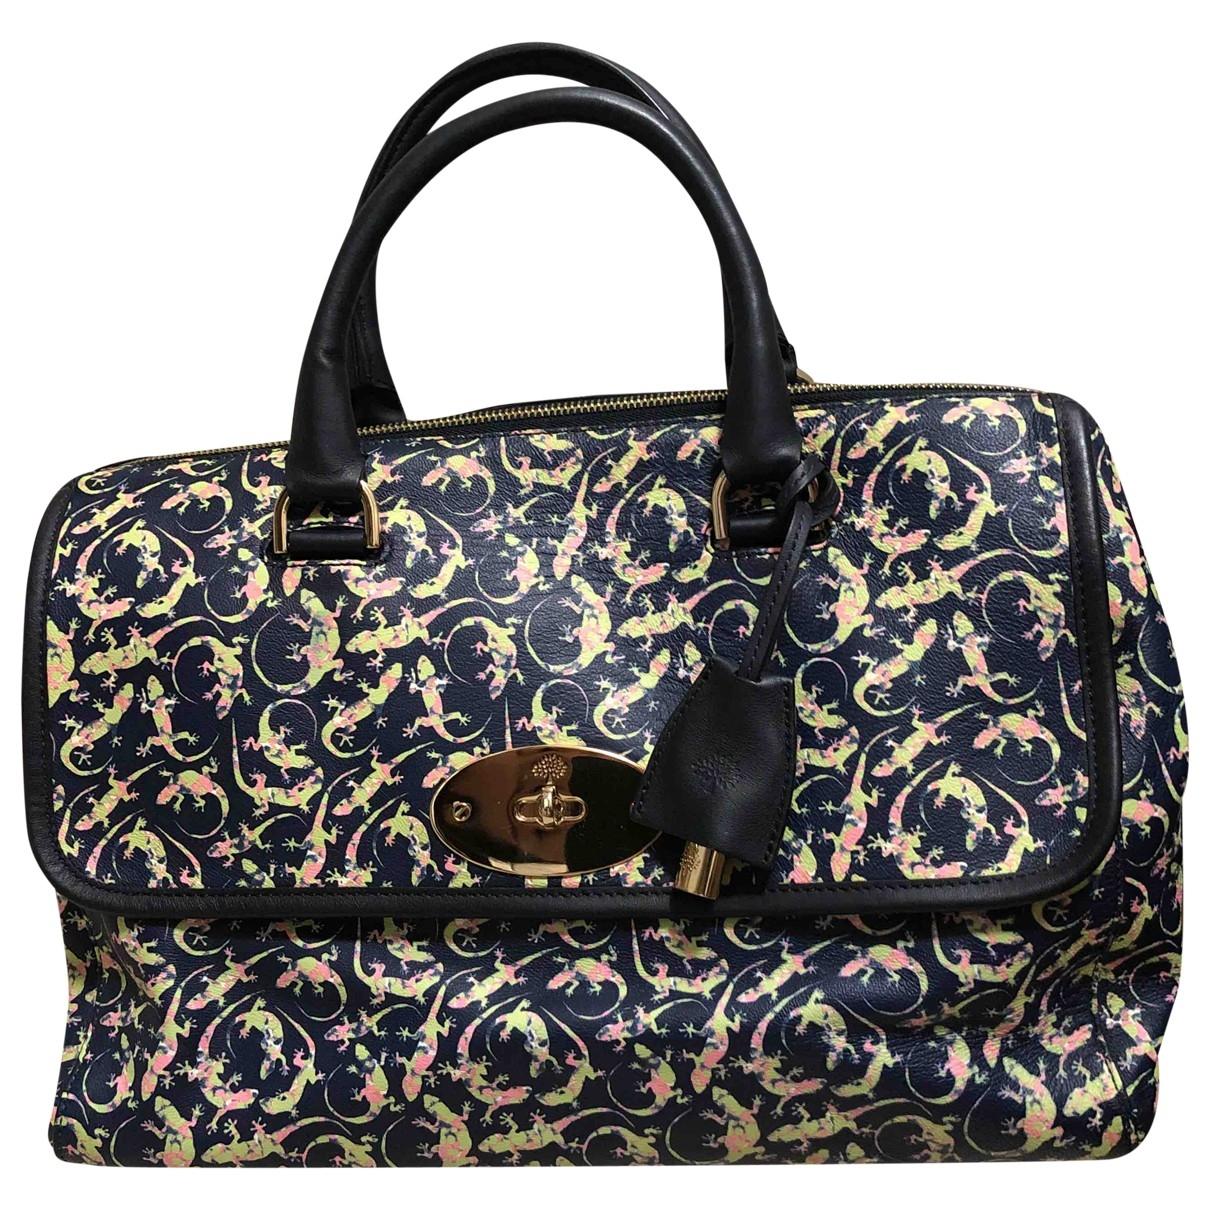 Mulberry \N Handtasche in  Bunt Leder